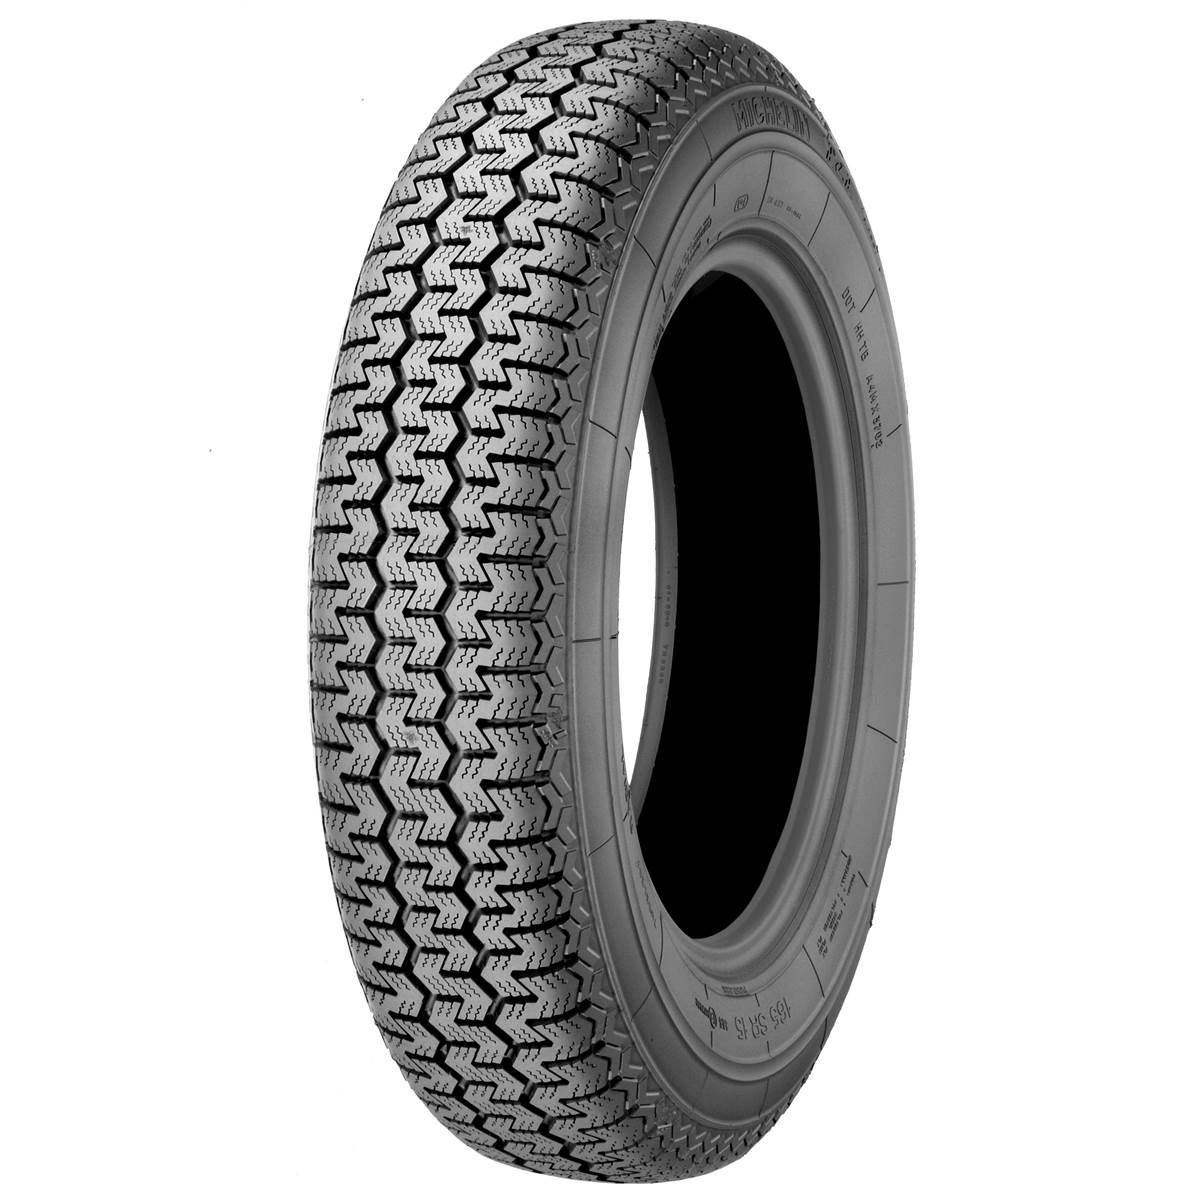 Pneu Michelin Collection 165/80R15 86S Xzx